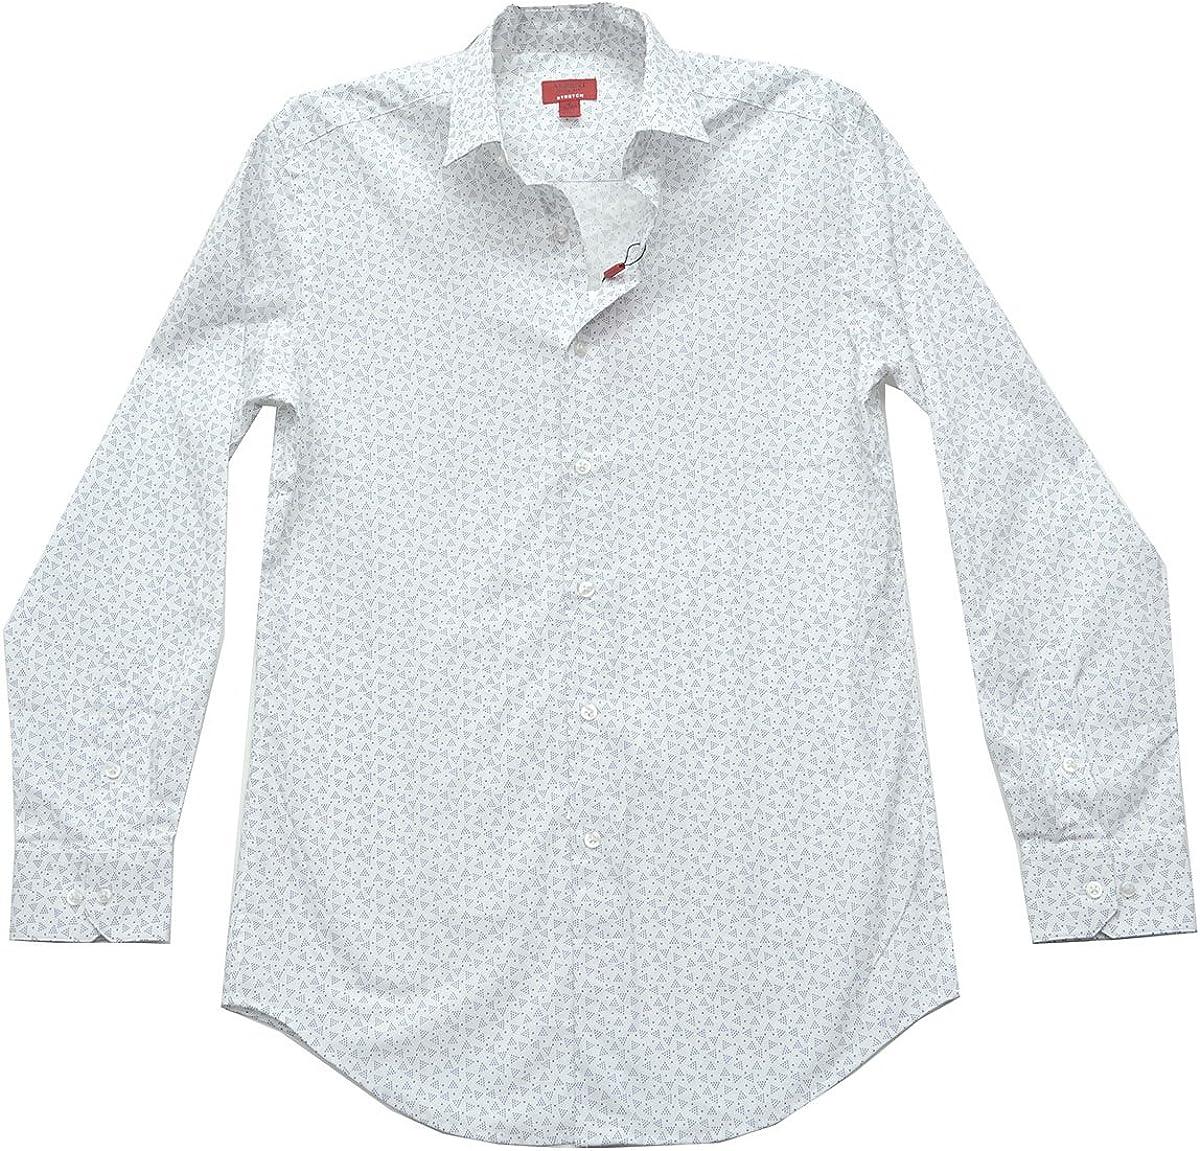 Alfani Red Label Slim Fit Men Long‑Sleeve Dress White Shirt Small 14-14.5-32/33